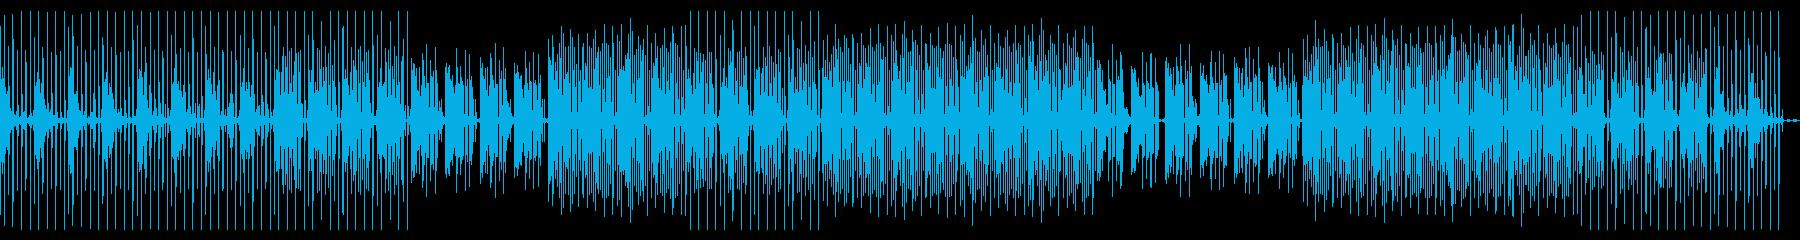 Deep house loungeの再生済みの波形